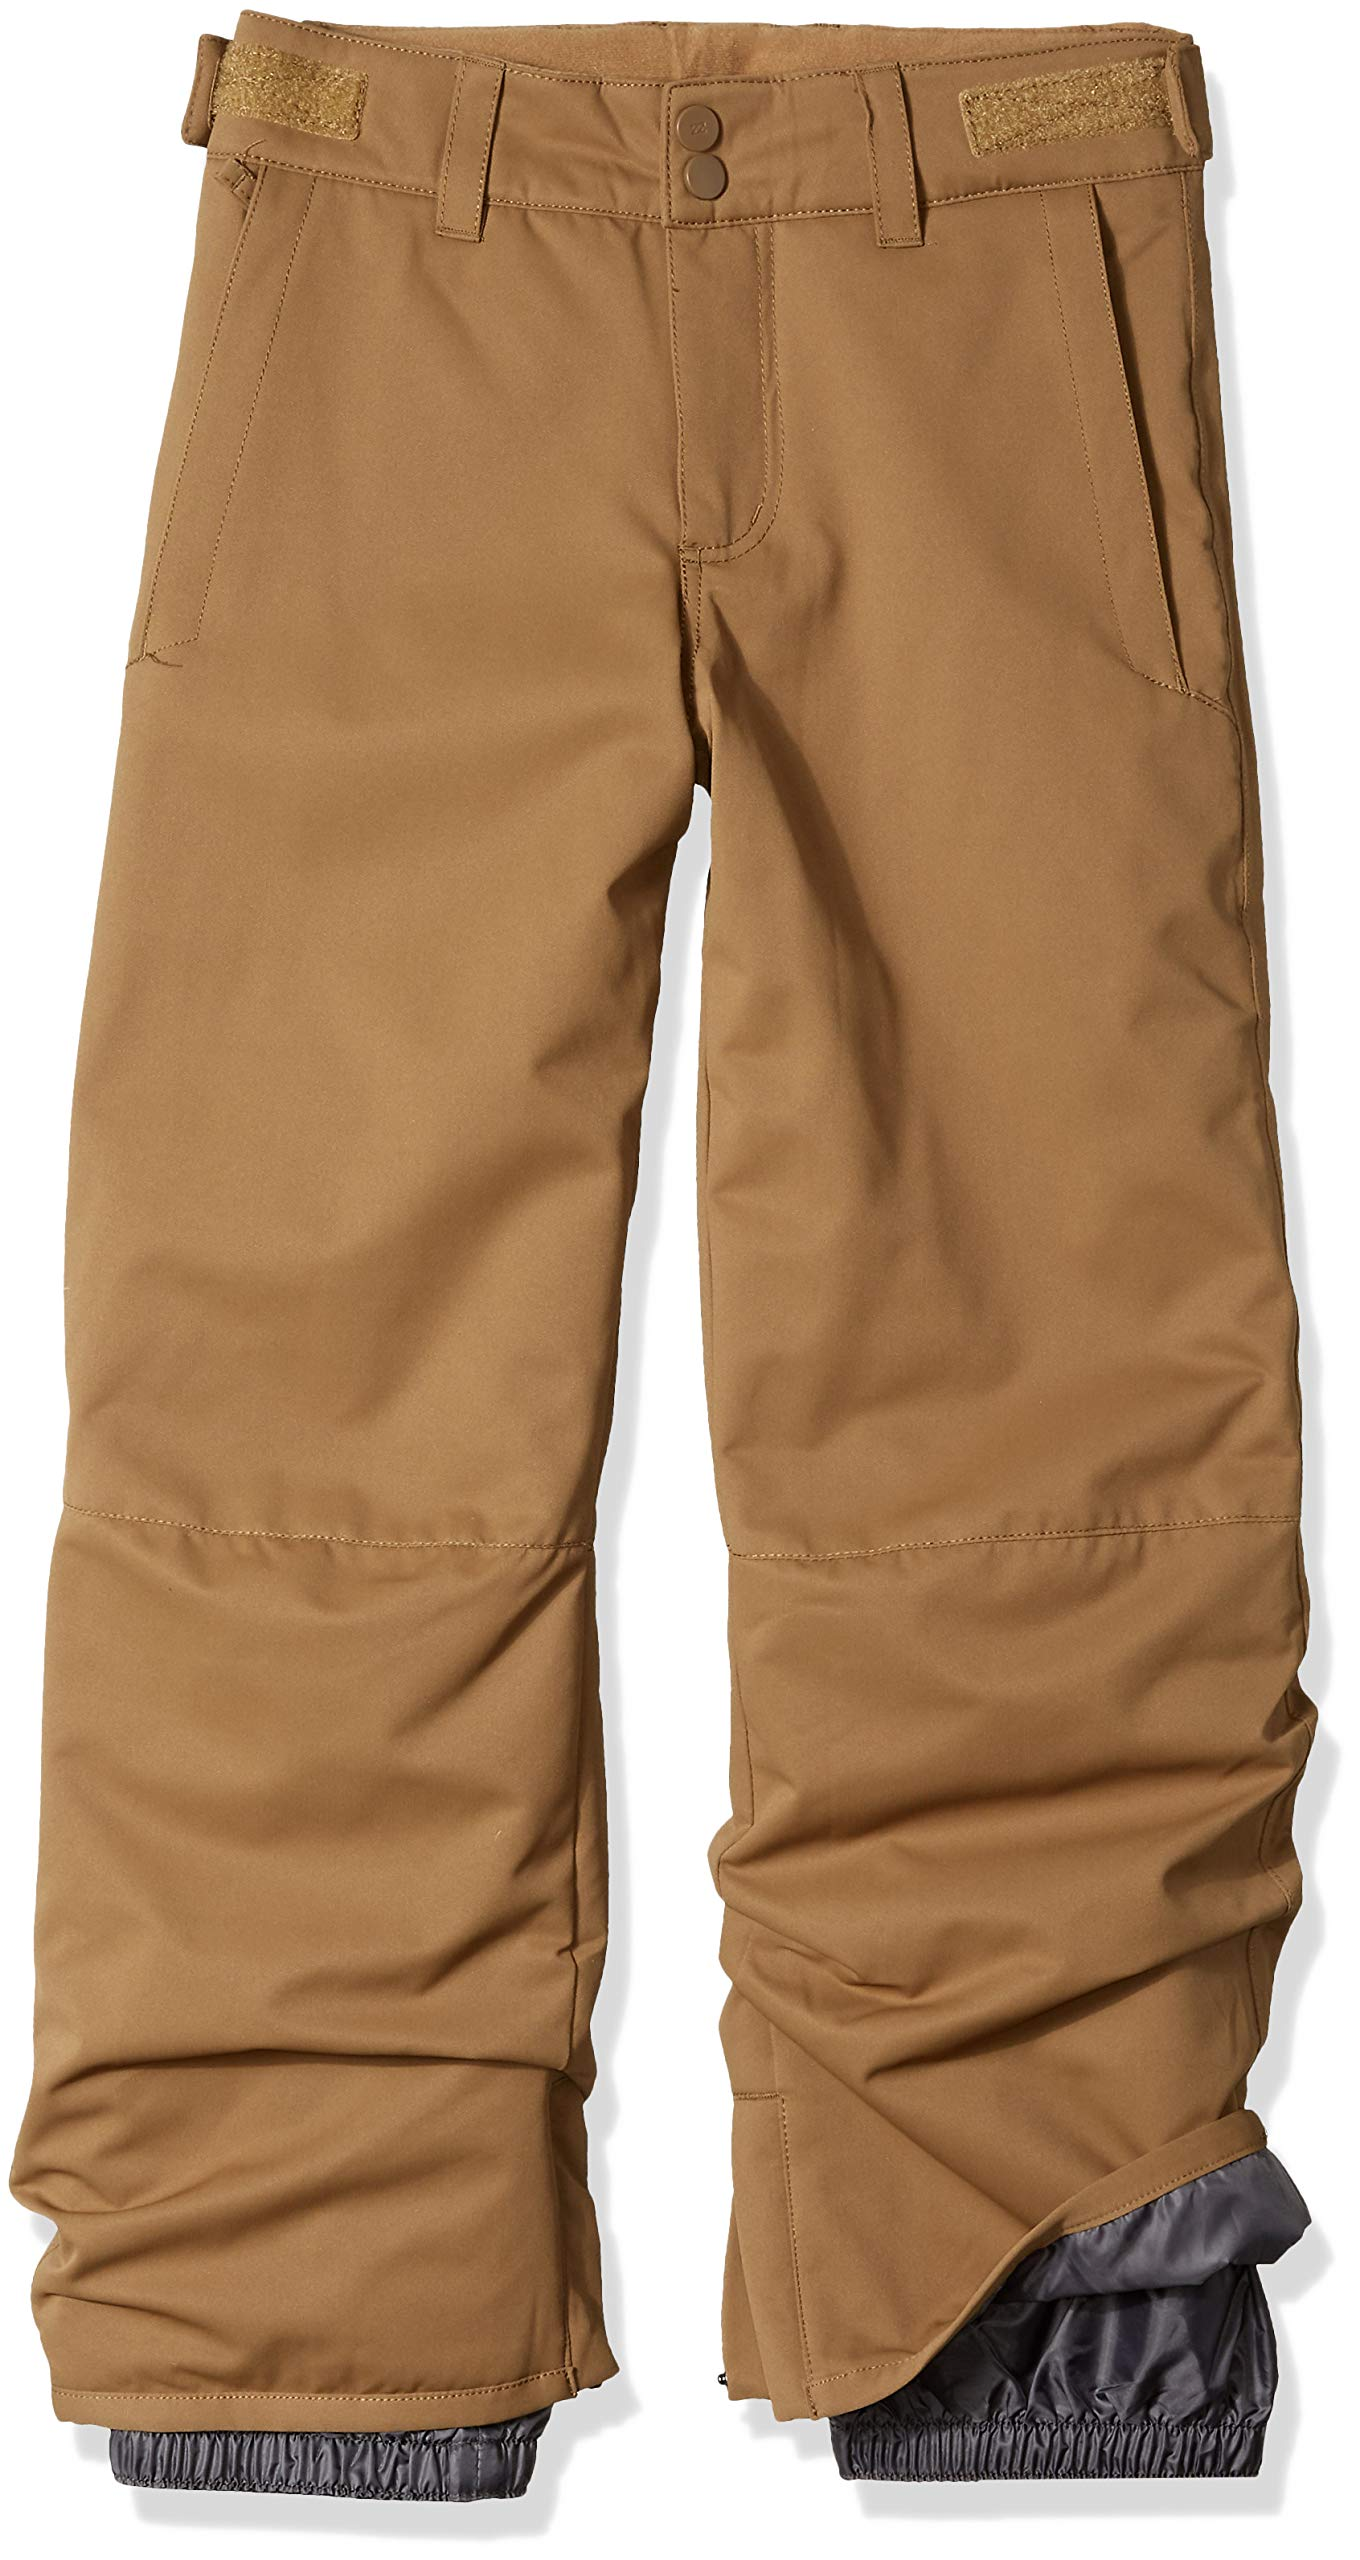 Billabong Boys' Grom Outerwear Pants Camel X-Large